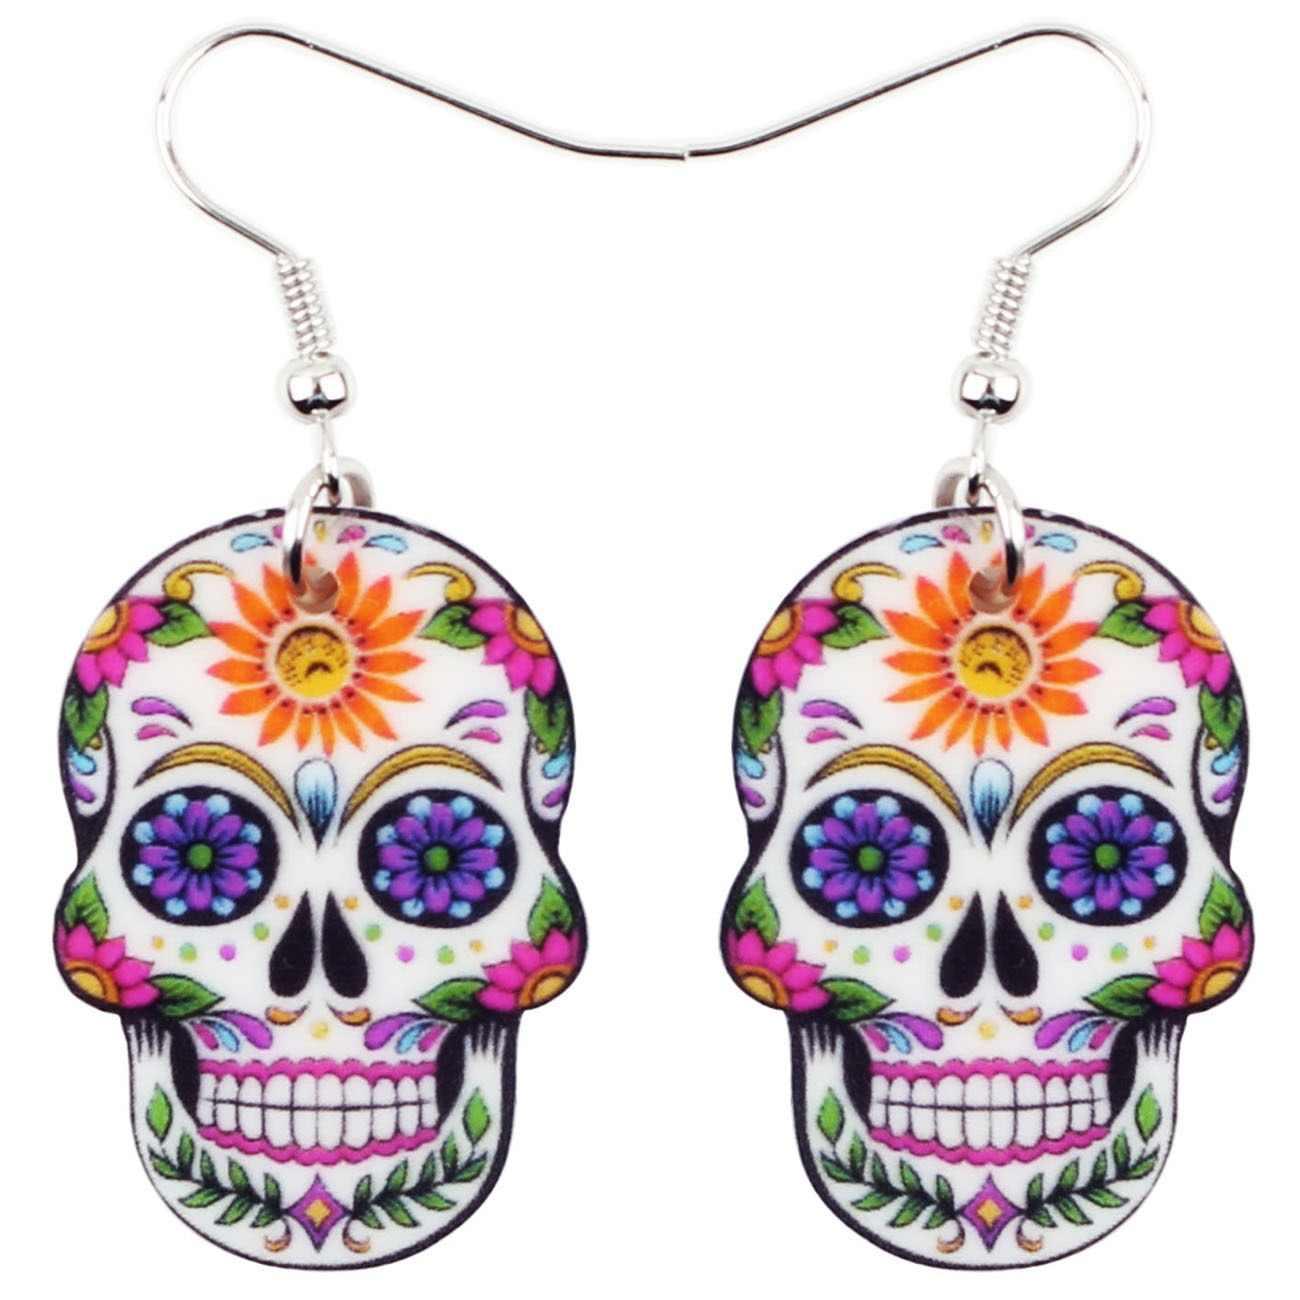 d989e7479 Bonsny Acrylic Dangle Drop Halloween Skeleton Skull Earrings Big Long Punk  Fashion Jewelry For Girls Women